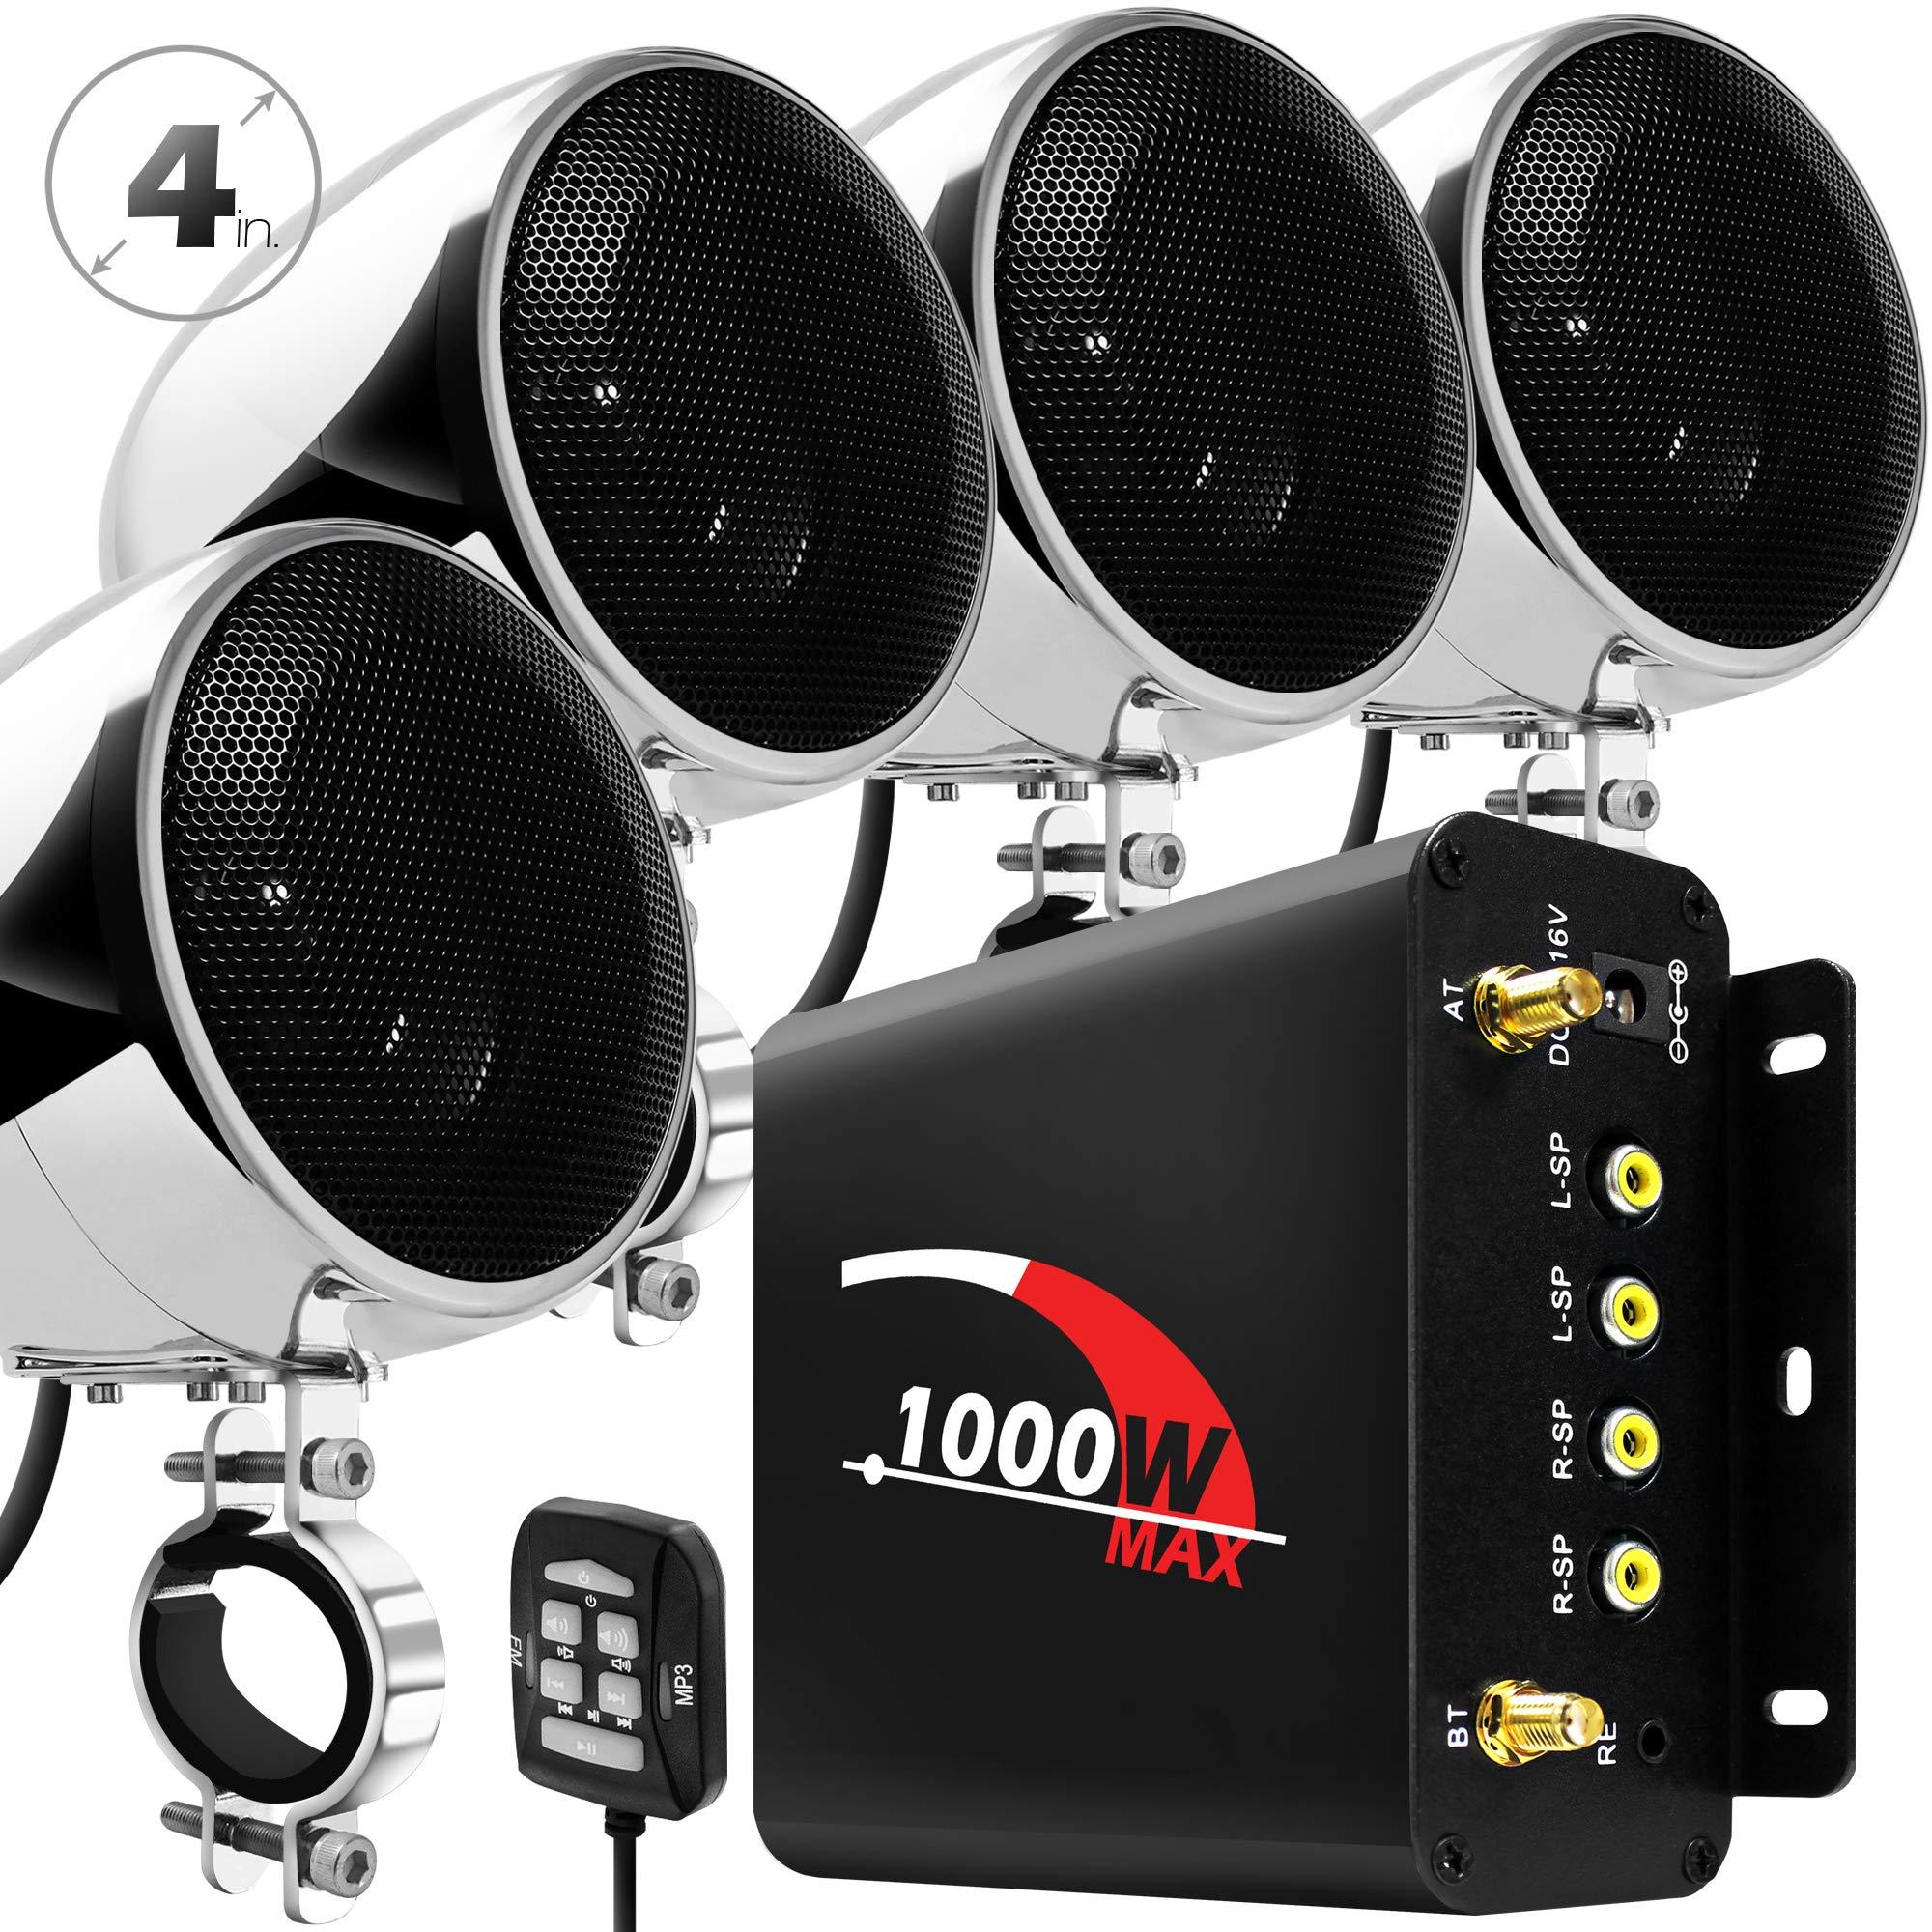 GoHawk TN4-Q 1000W 4 Channel Amplifier 4'' Full Range Waterproof Bluetooth Motorcycle Stereo Speakers Audio System AUX USB SD Radio for 1-1.5'' Handlebar Harley Touring Cruiser ATV